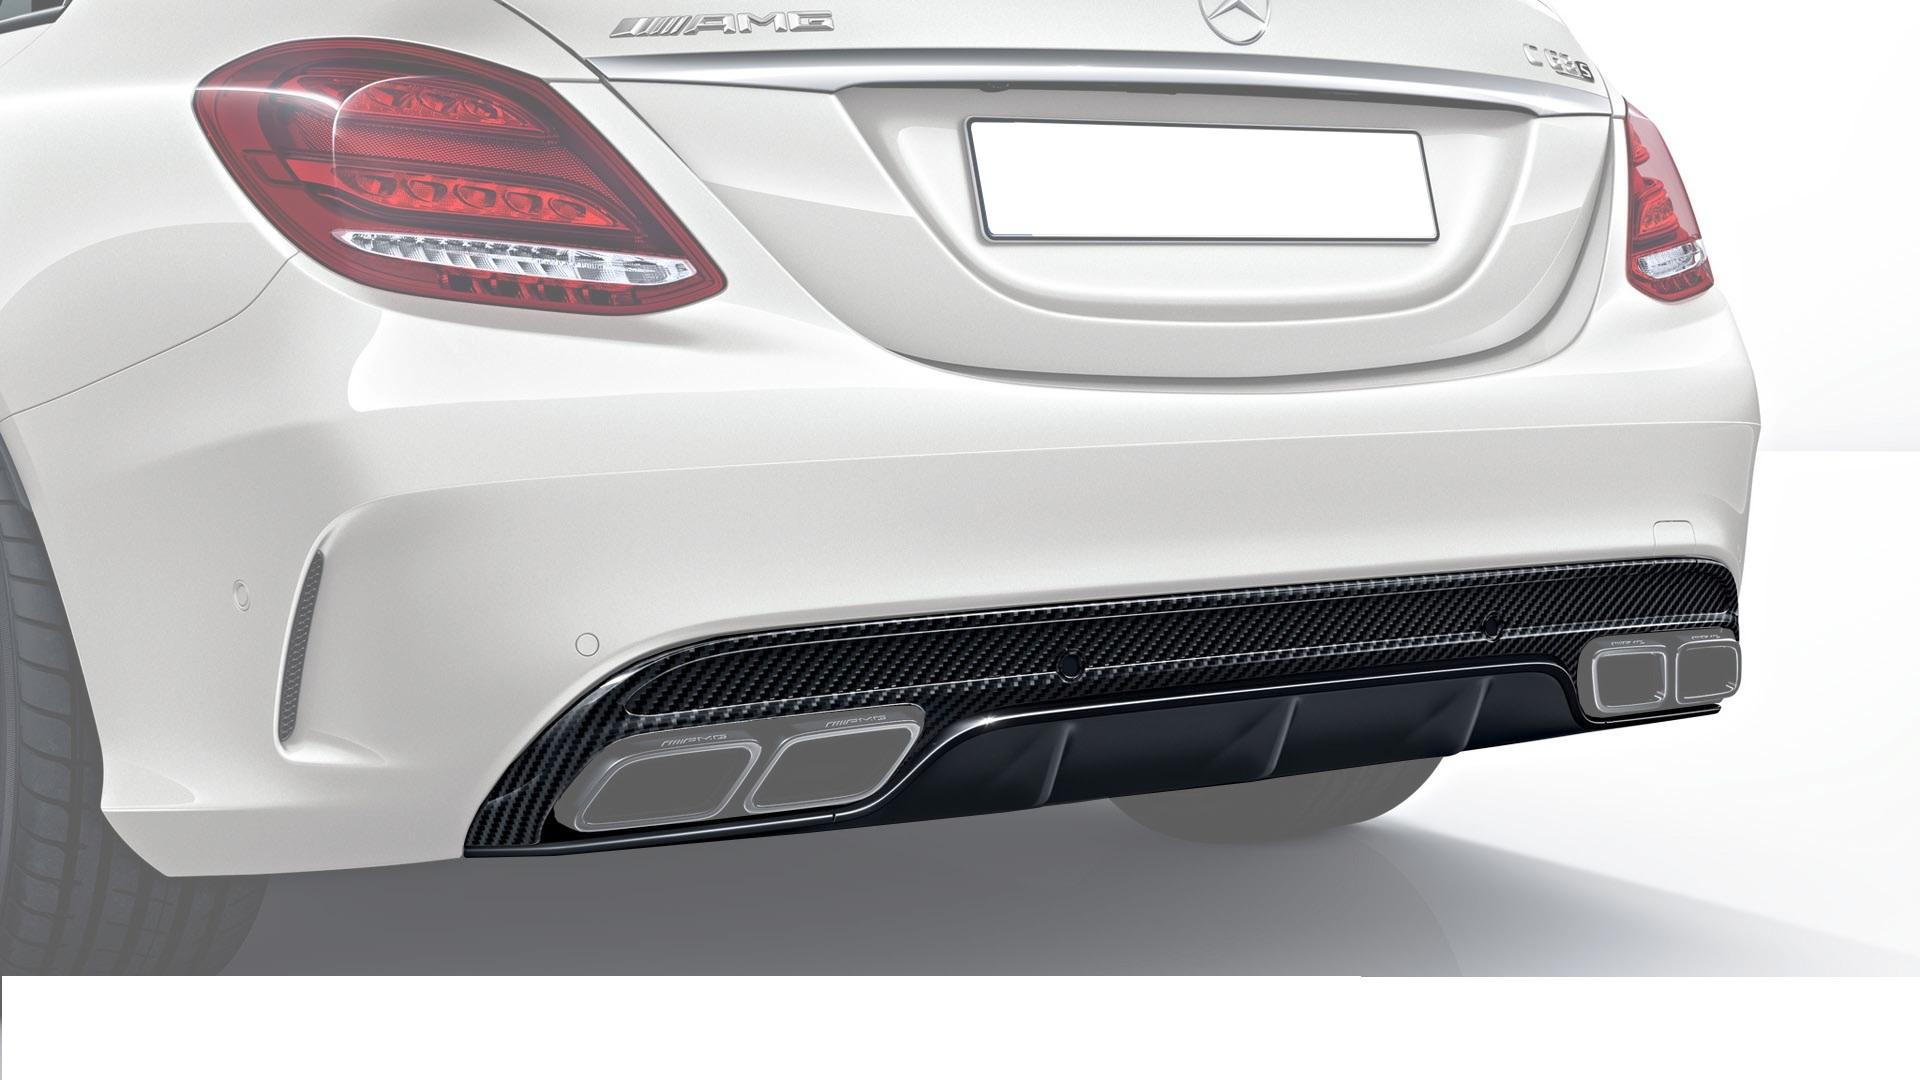 Карбоновый диффузор заднего бампера AMG Style для Mercedes С-class W205